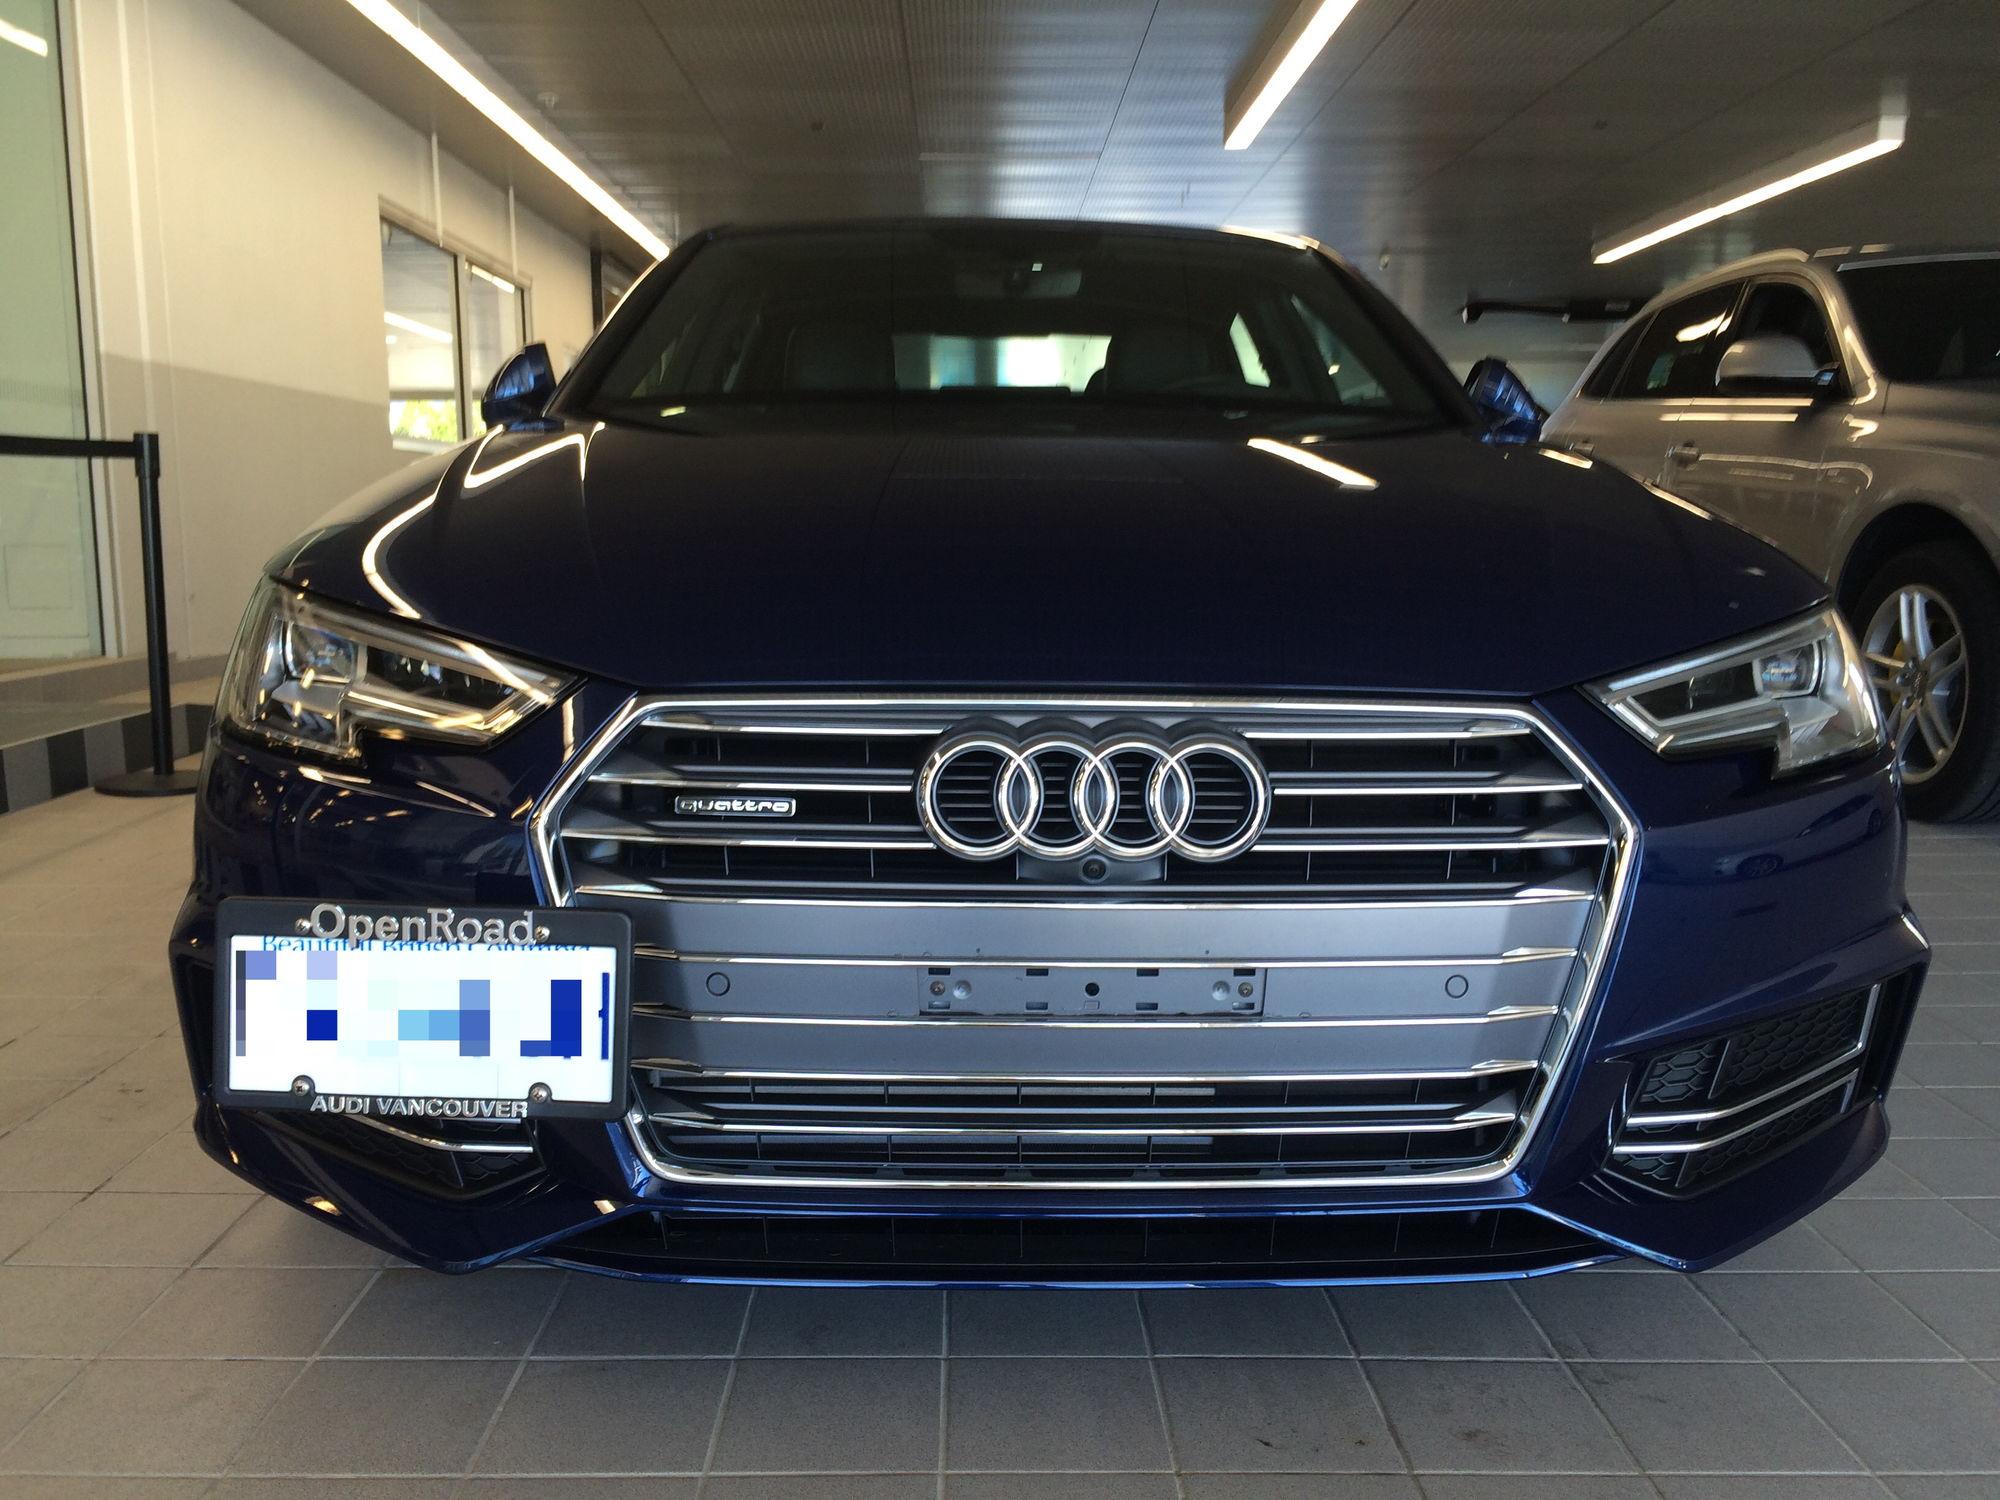 Tow Hook License Plate Holder Audiworld Forums